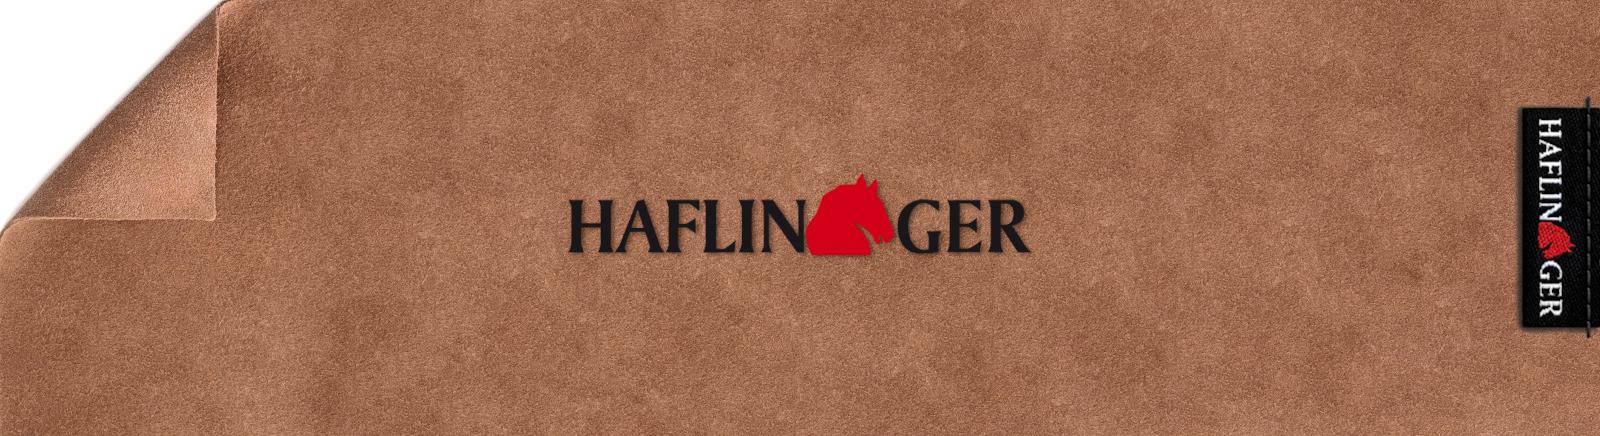 Gisy: Haflinger Hausschuhe für Herren online shoppen